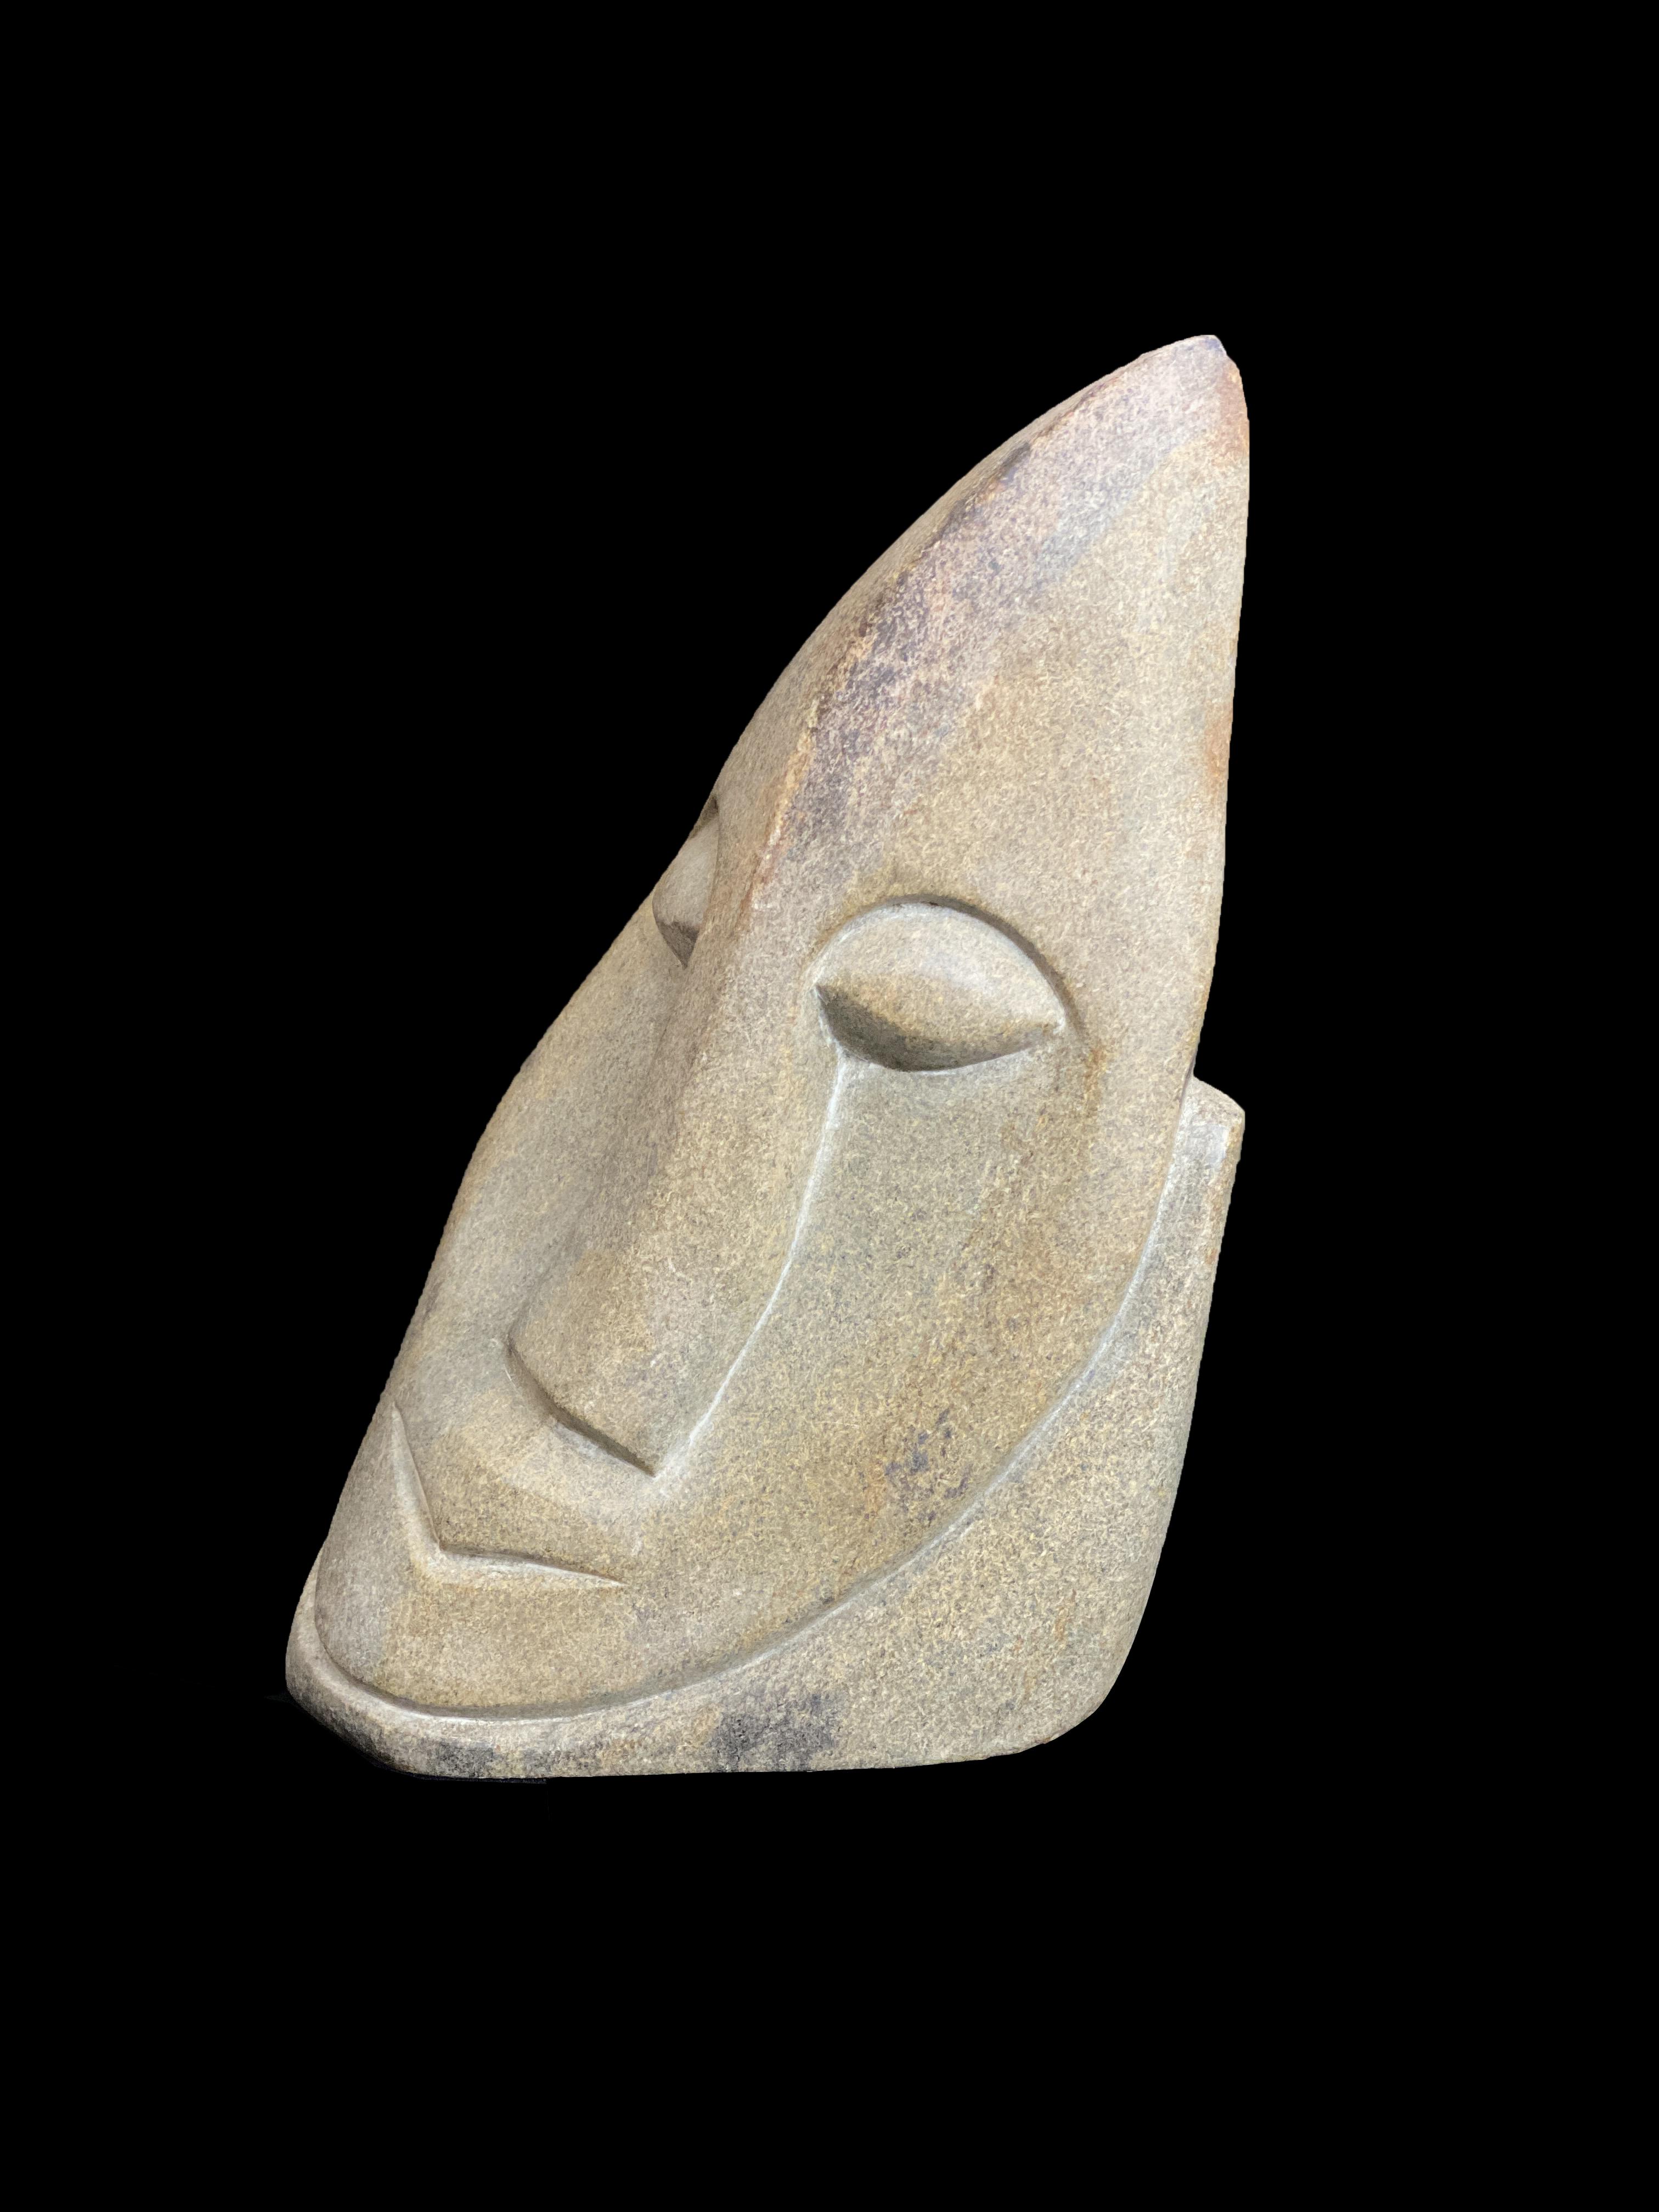 Shona Stone Sculpture - Zimbabwe